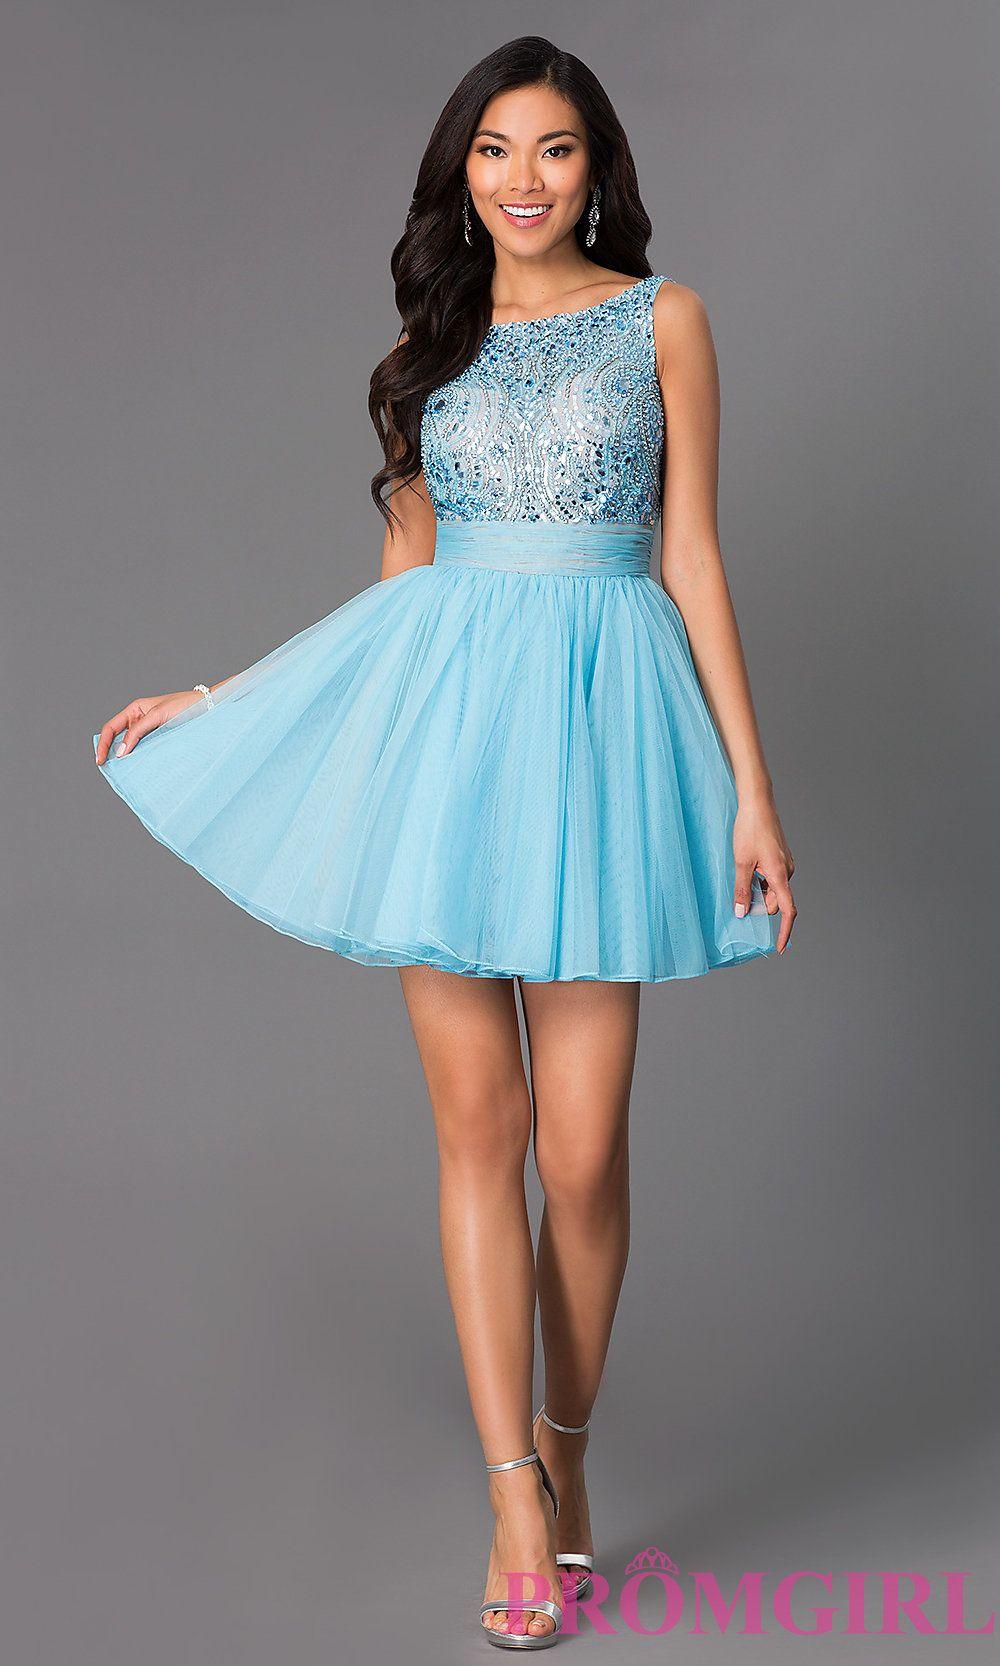 Gorgeous Beaded Short Dress In Light Blue By Sherri Hill Dress Style Sh 11032 Short Dresses Prom Dresses Long Blue Dresses [ 1666 x 1000 Pixel ]